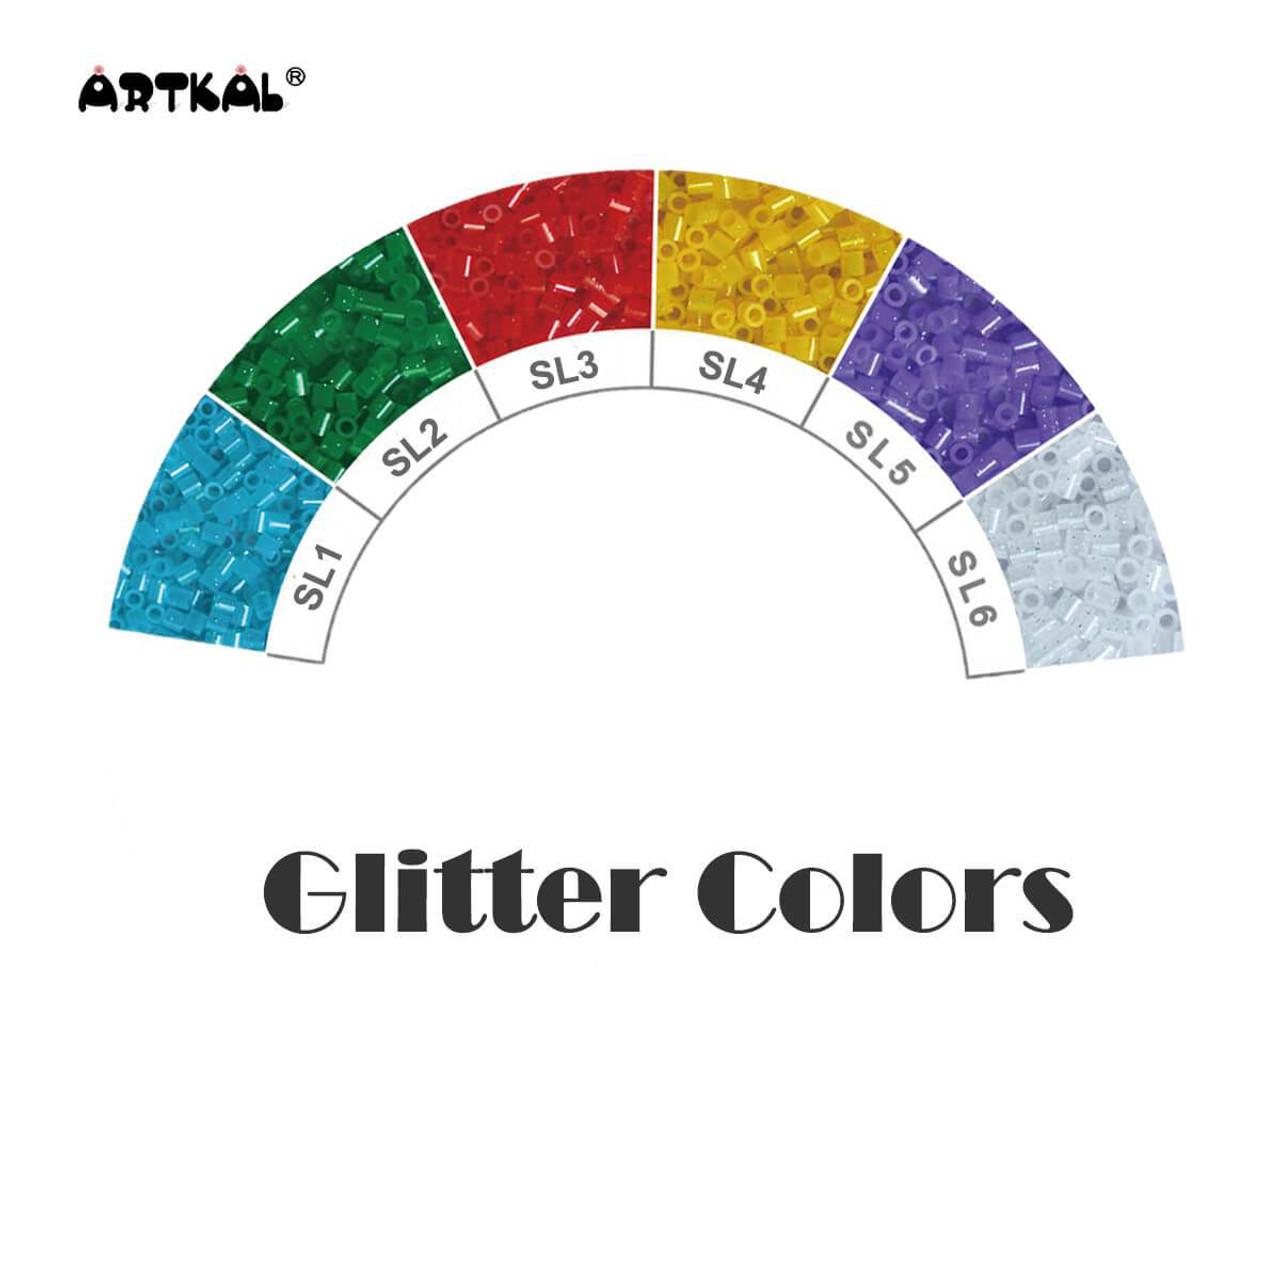 Artkal Glitter